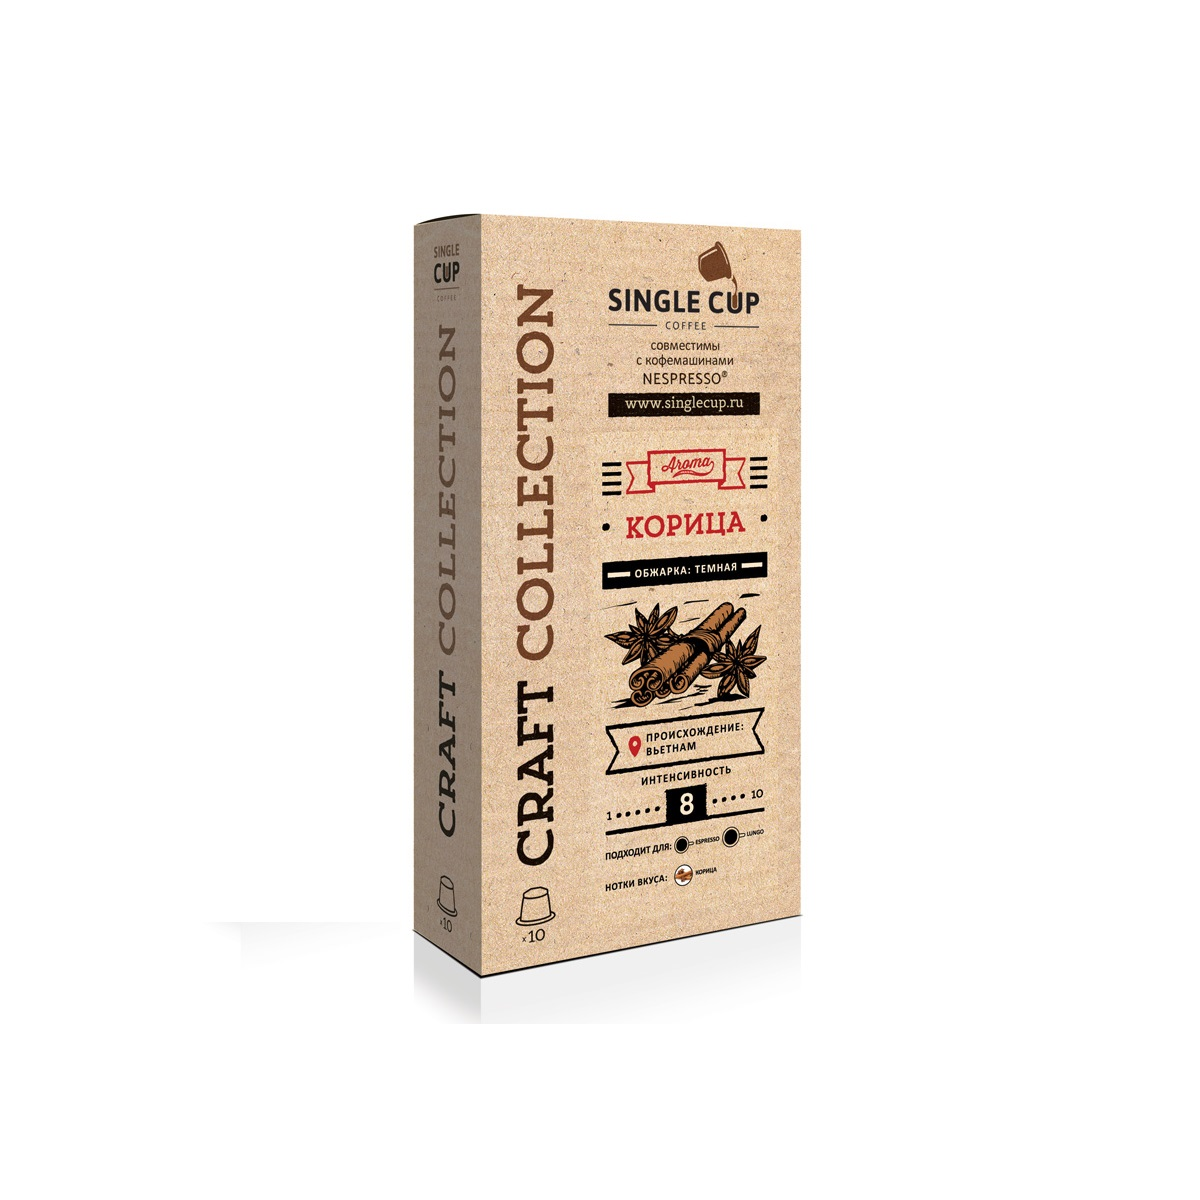 Капсулы Single Cup сoffee корица для кофемашин Nespresso 10 капсул